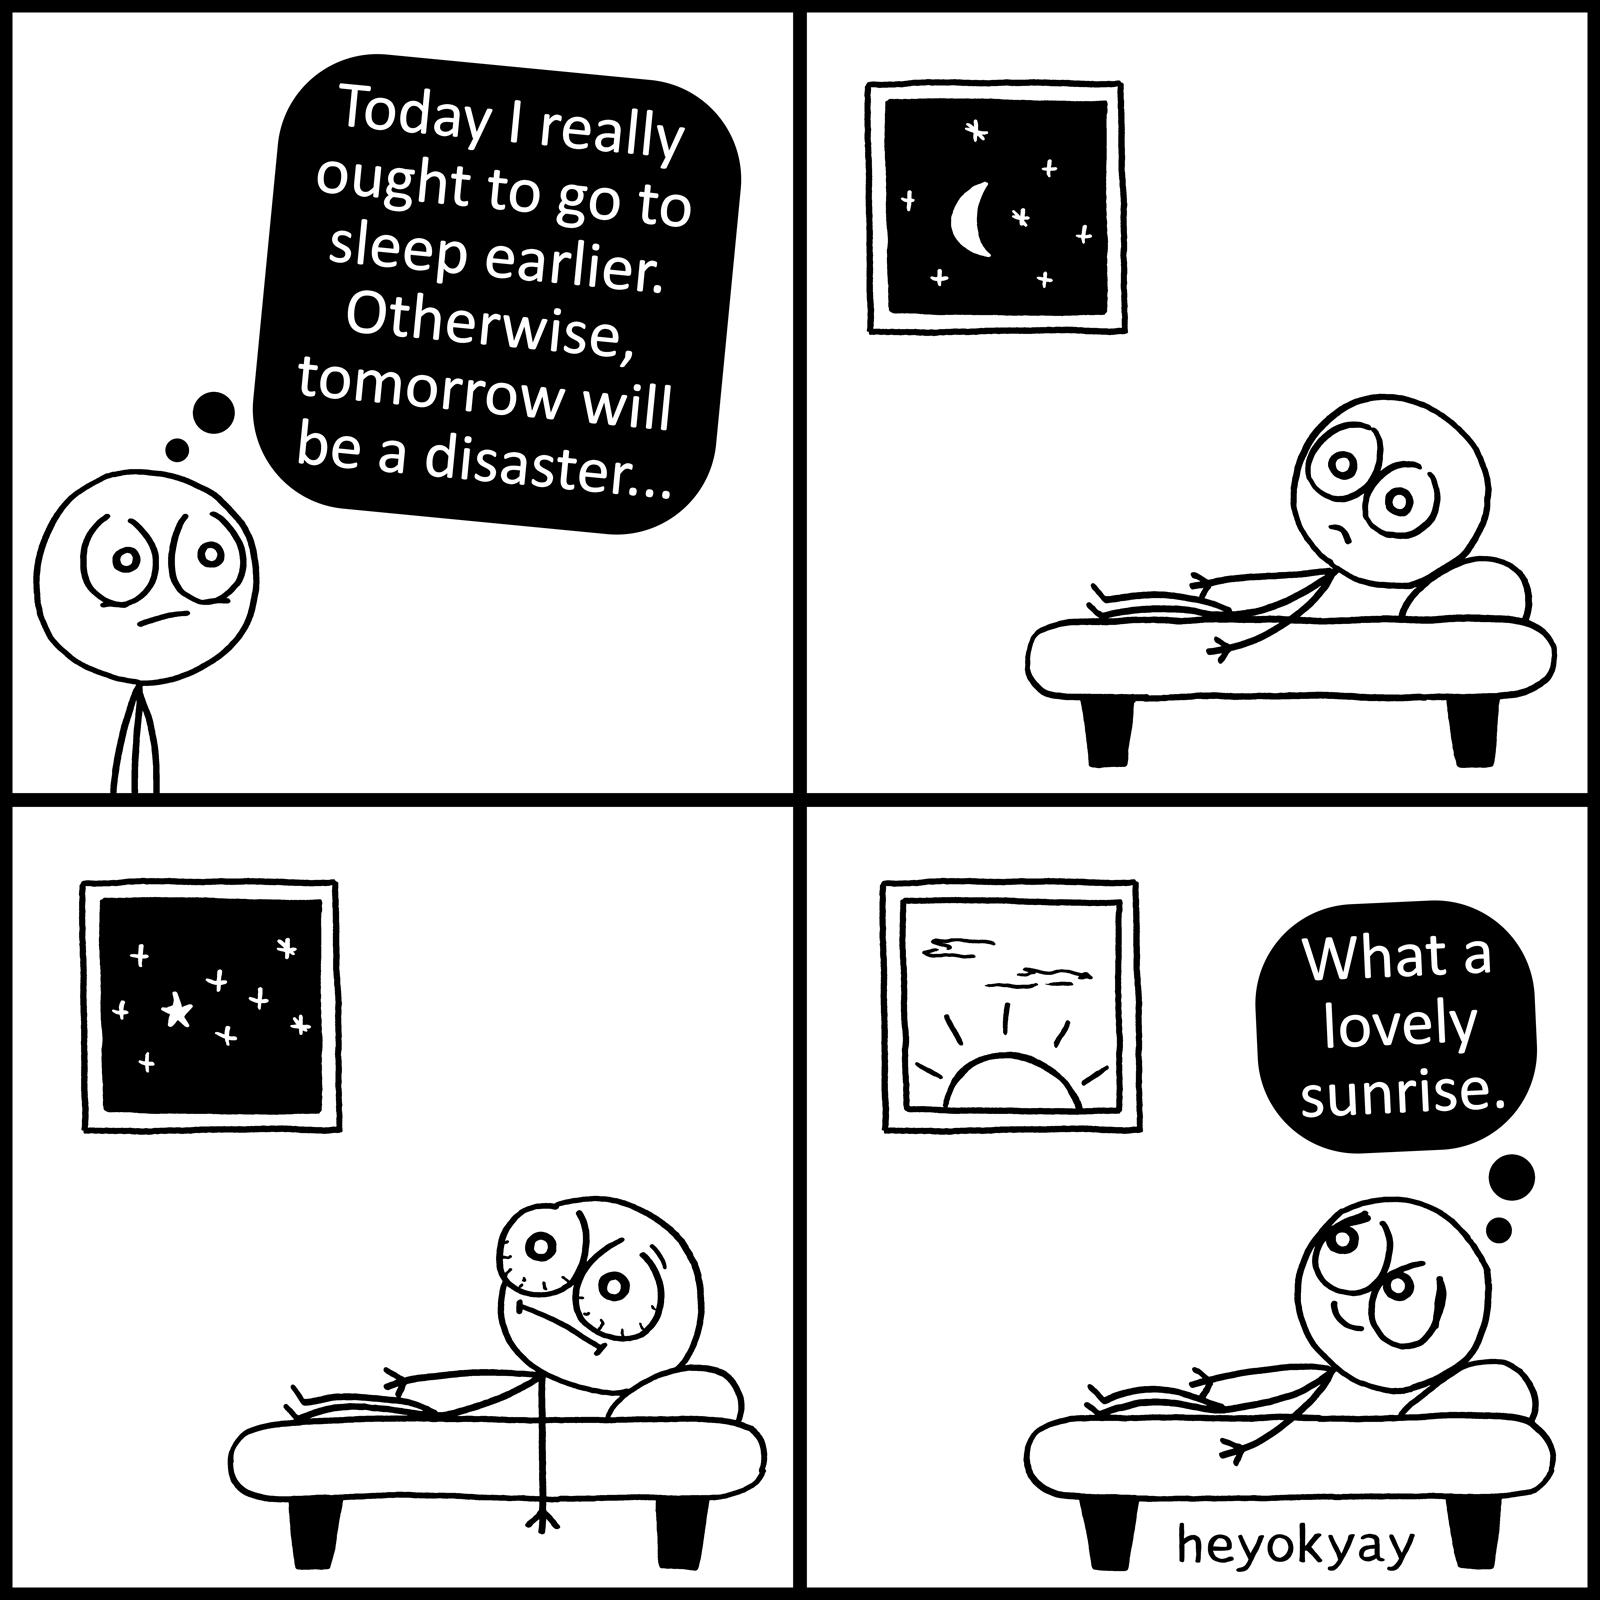 Disaster heyokyay comic